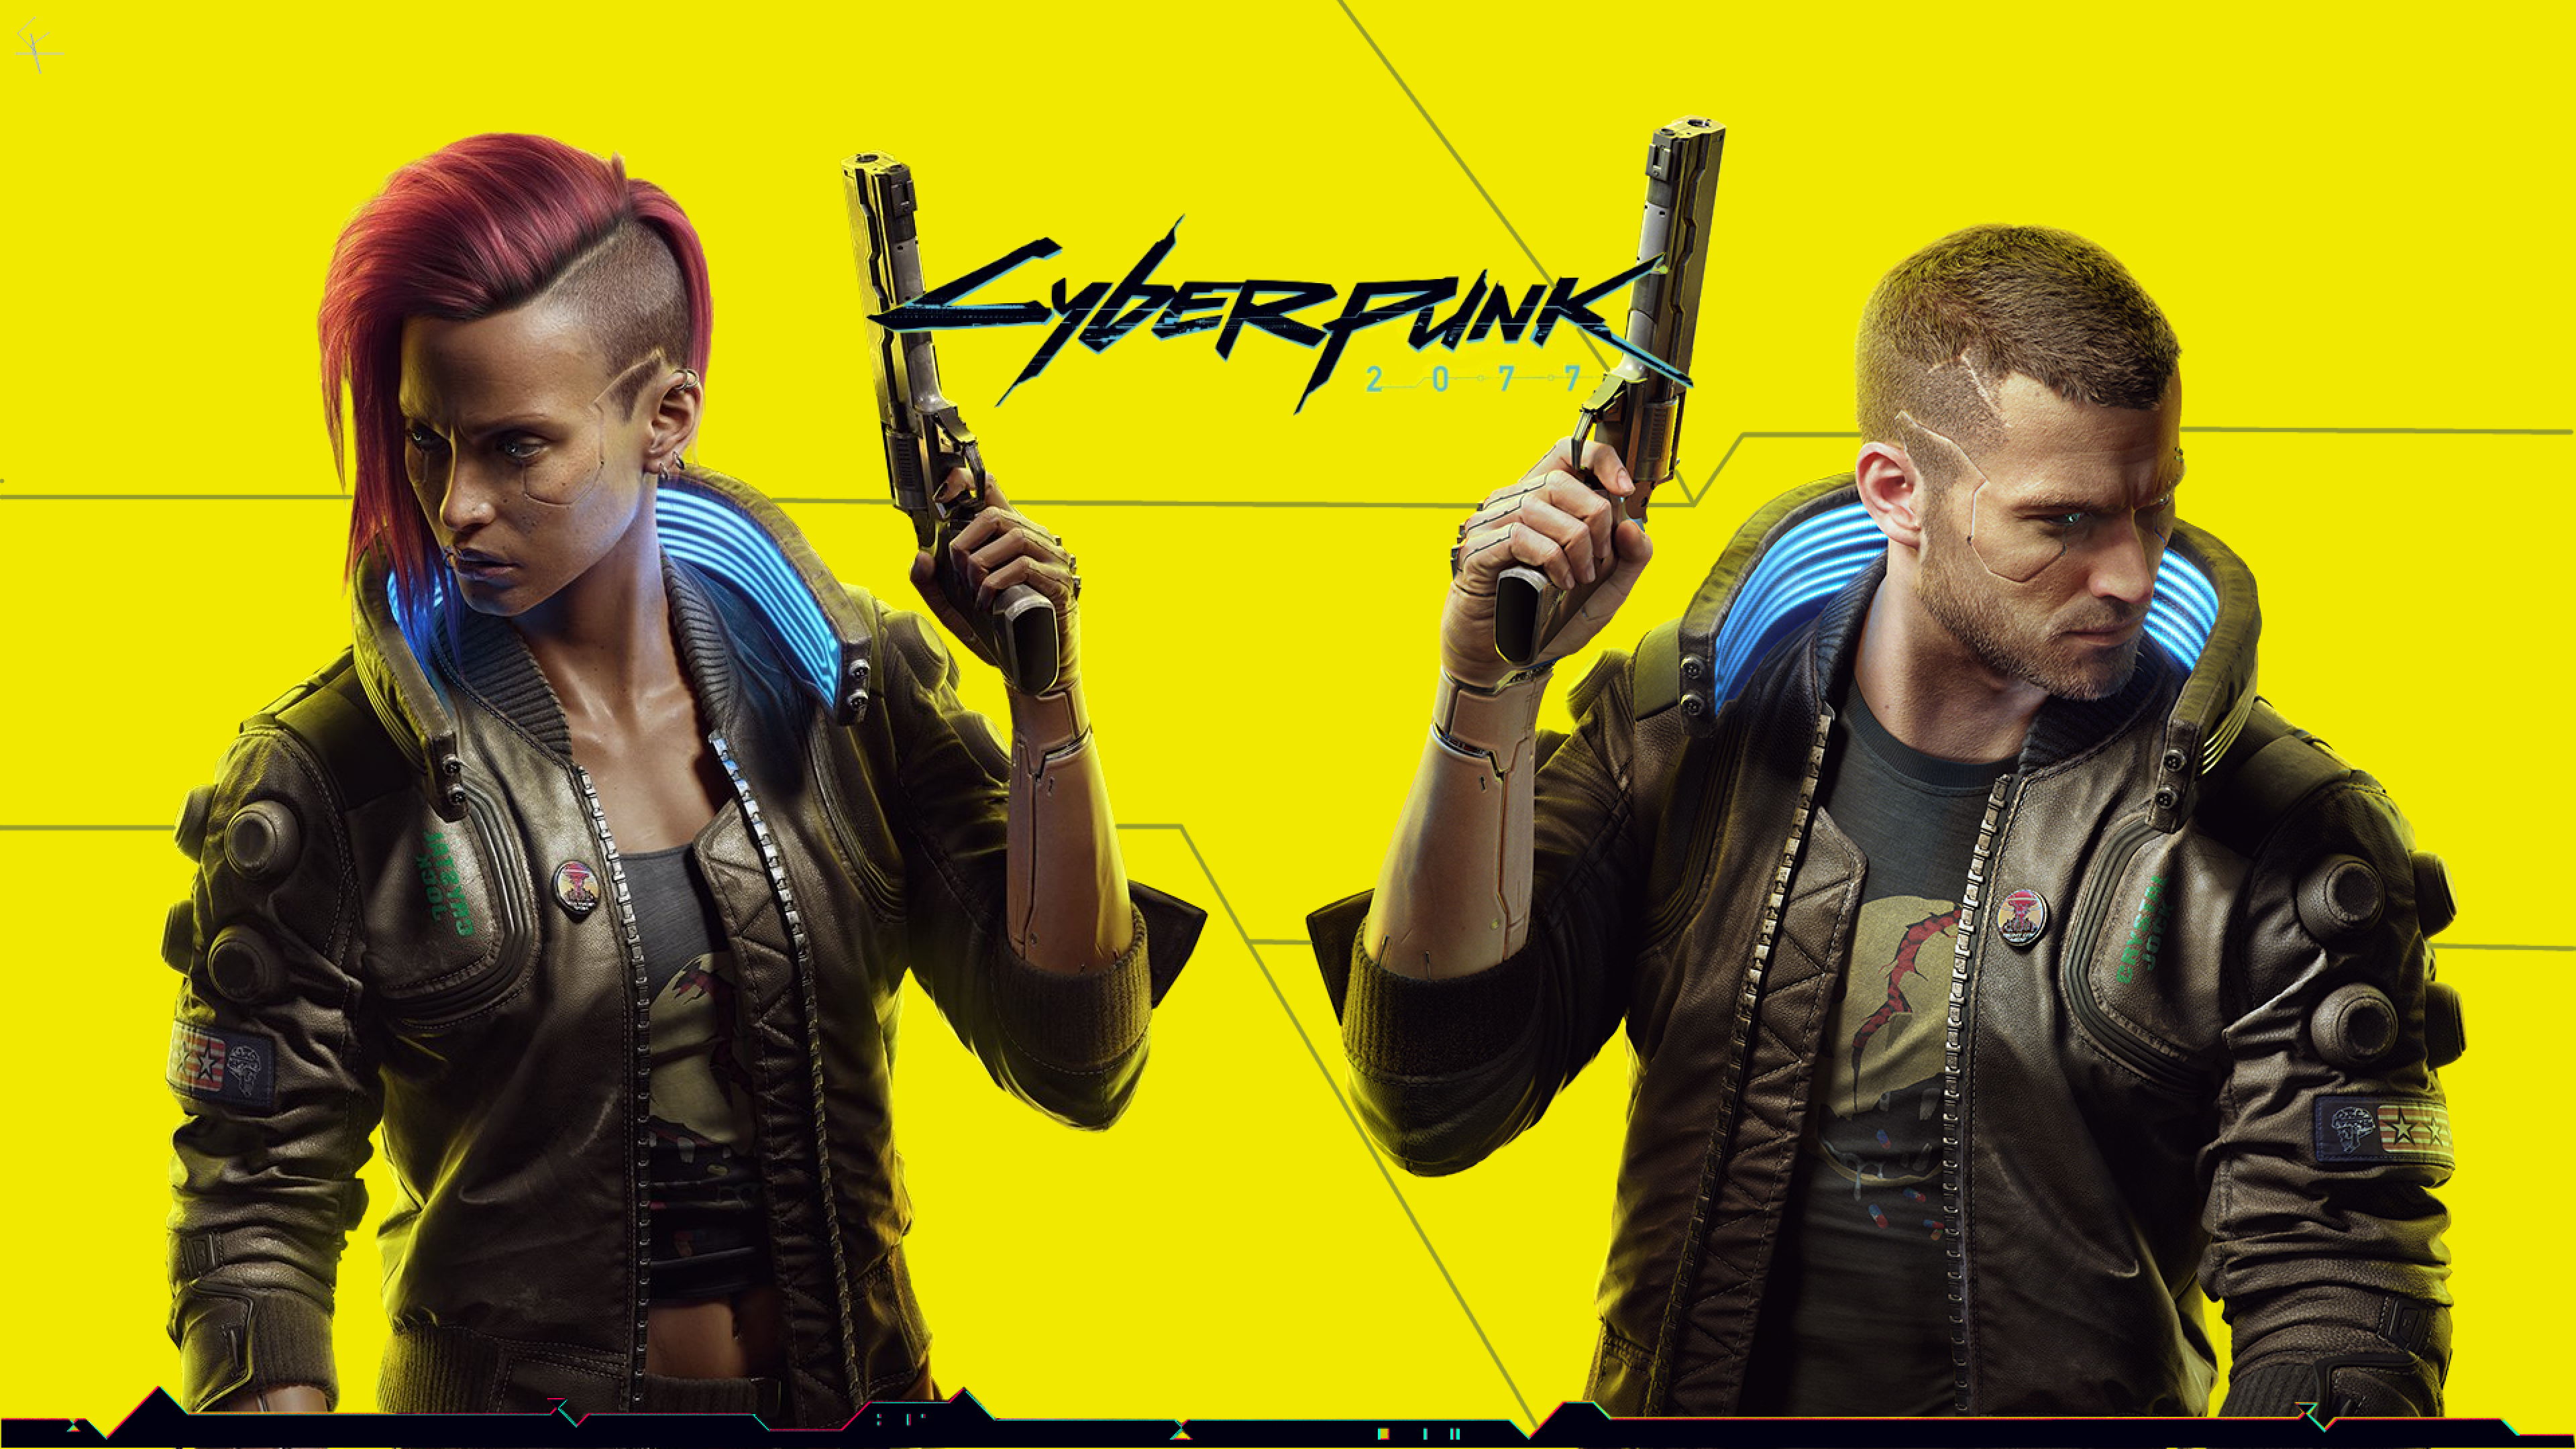 3840x2160 Background of Cyberpunk 2077 4K Wallpaper, HD ...